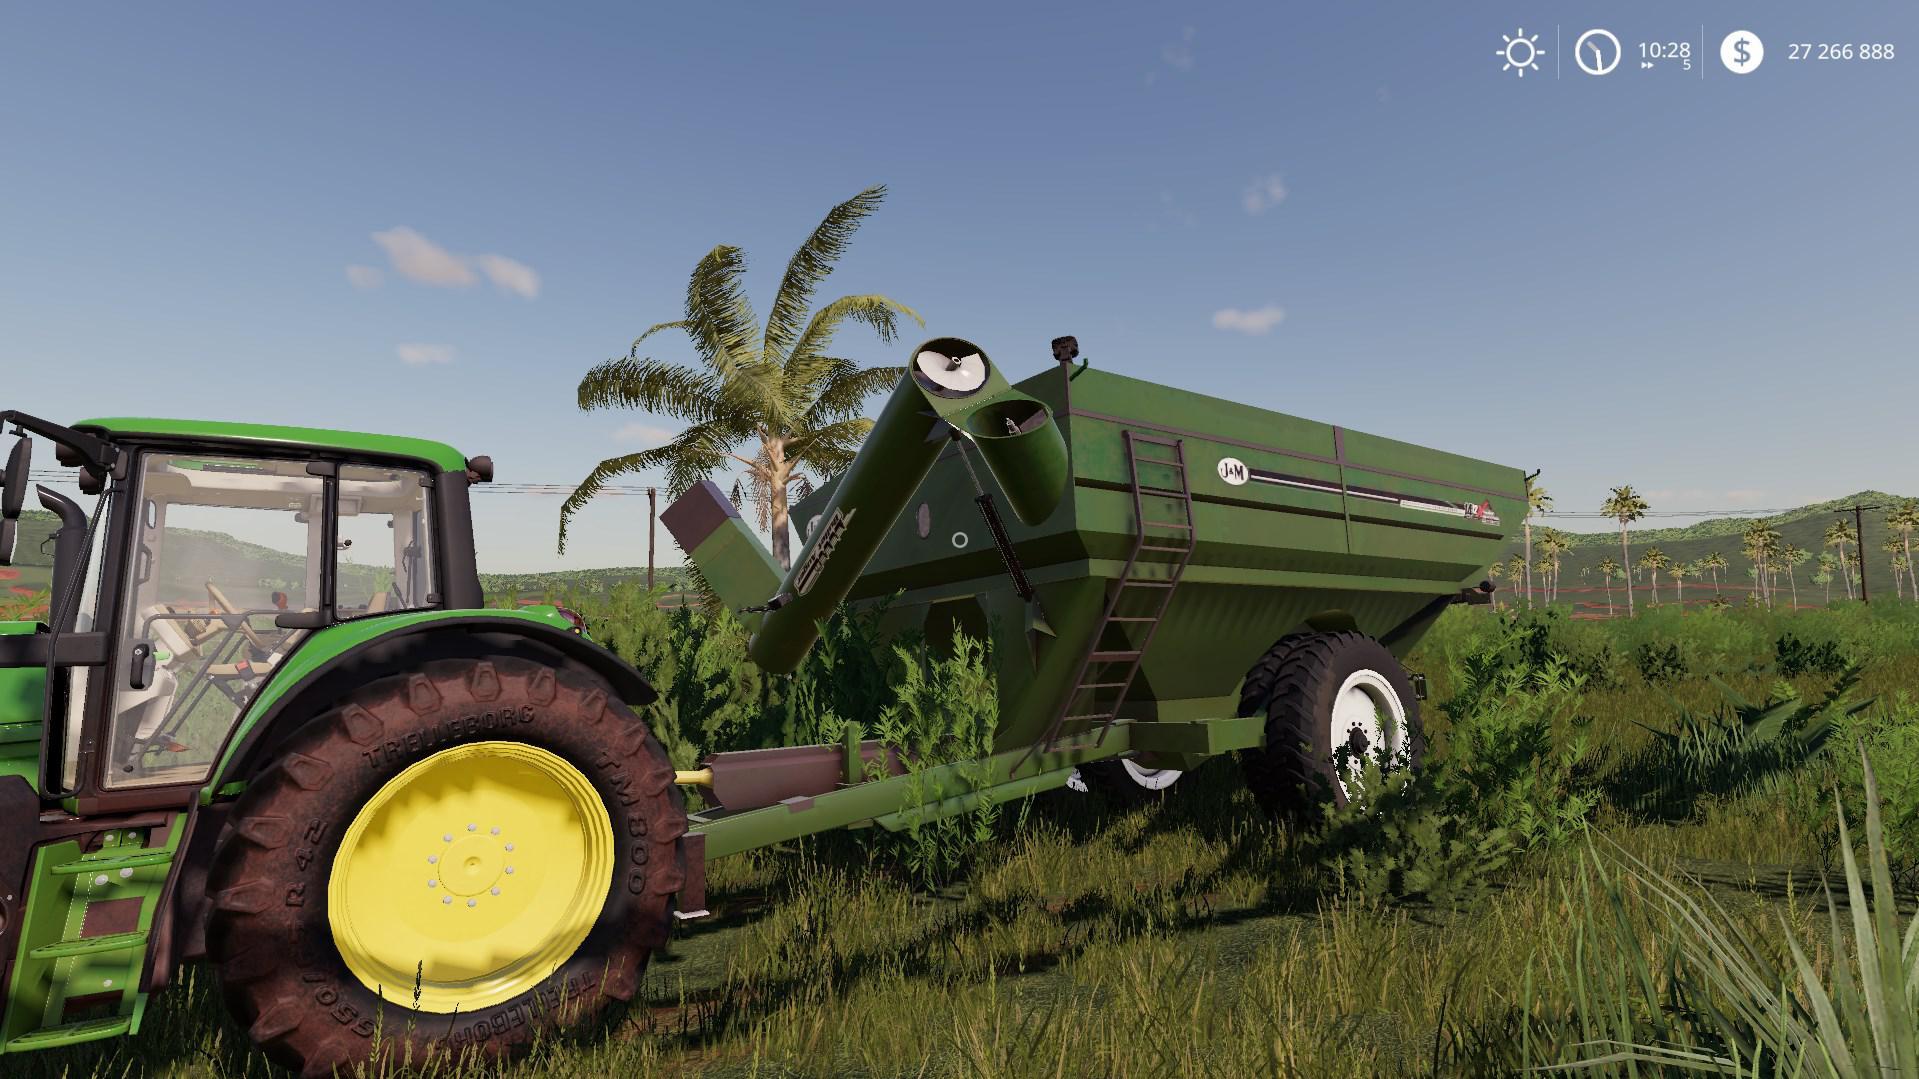 53 The Squad, SpencerTV, And RCC Trailer v1 0 FS19 - Farming